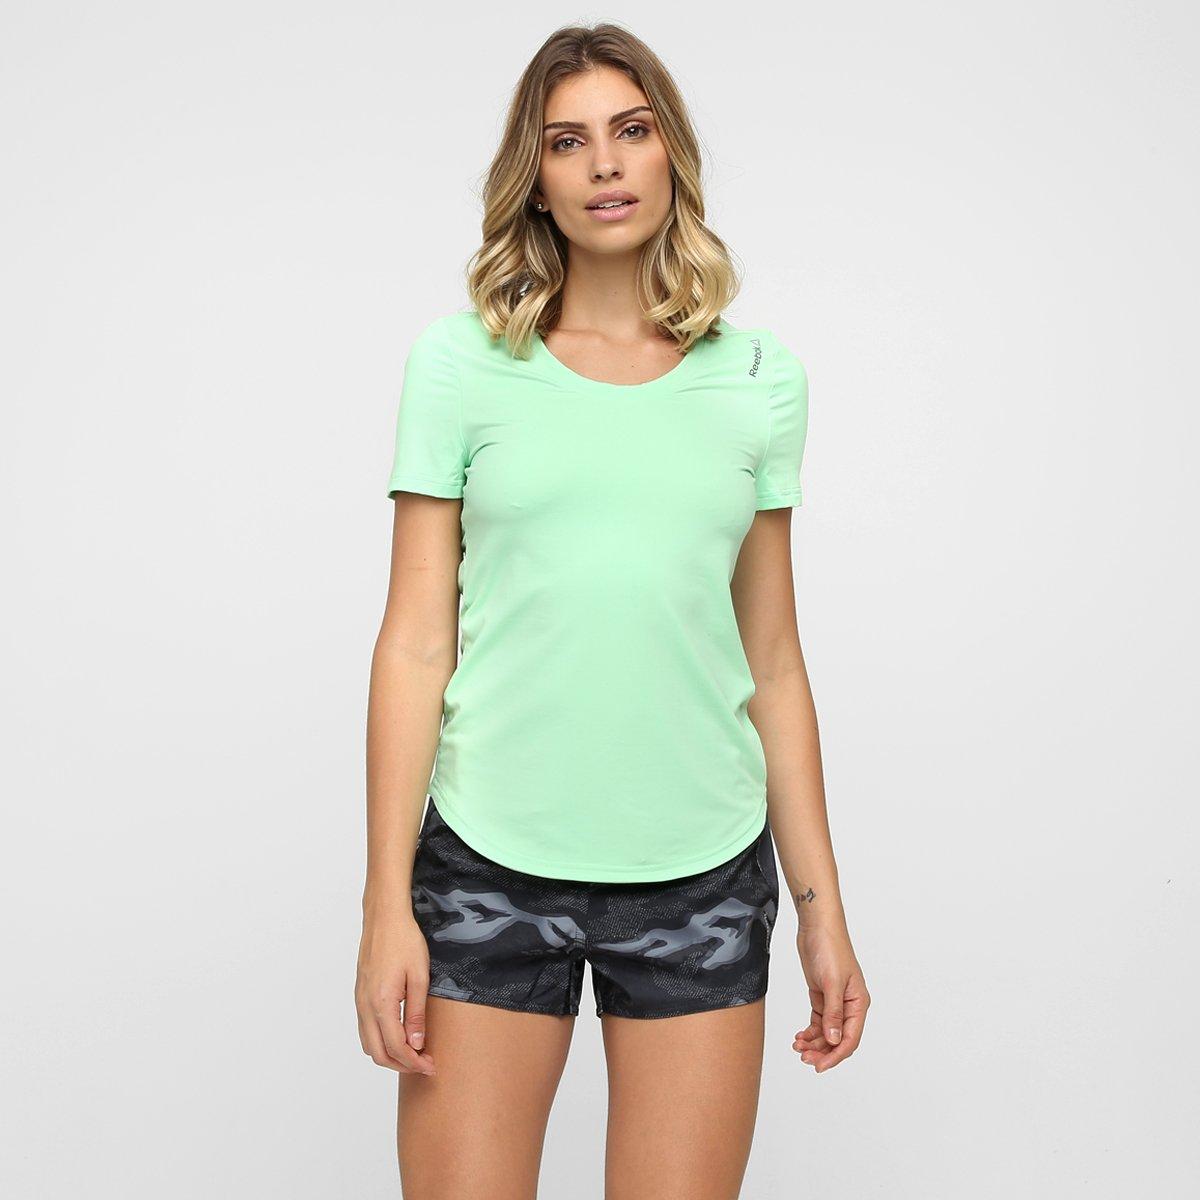 Camiseta Feminina claro Reebok Camiseta Reebok Wor Wor Verde Pd STS41xr